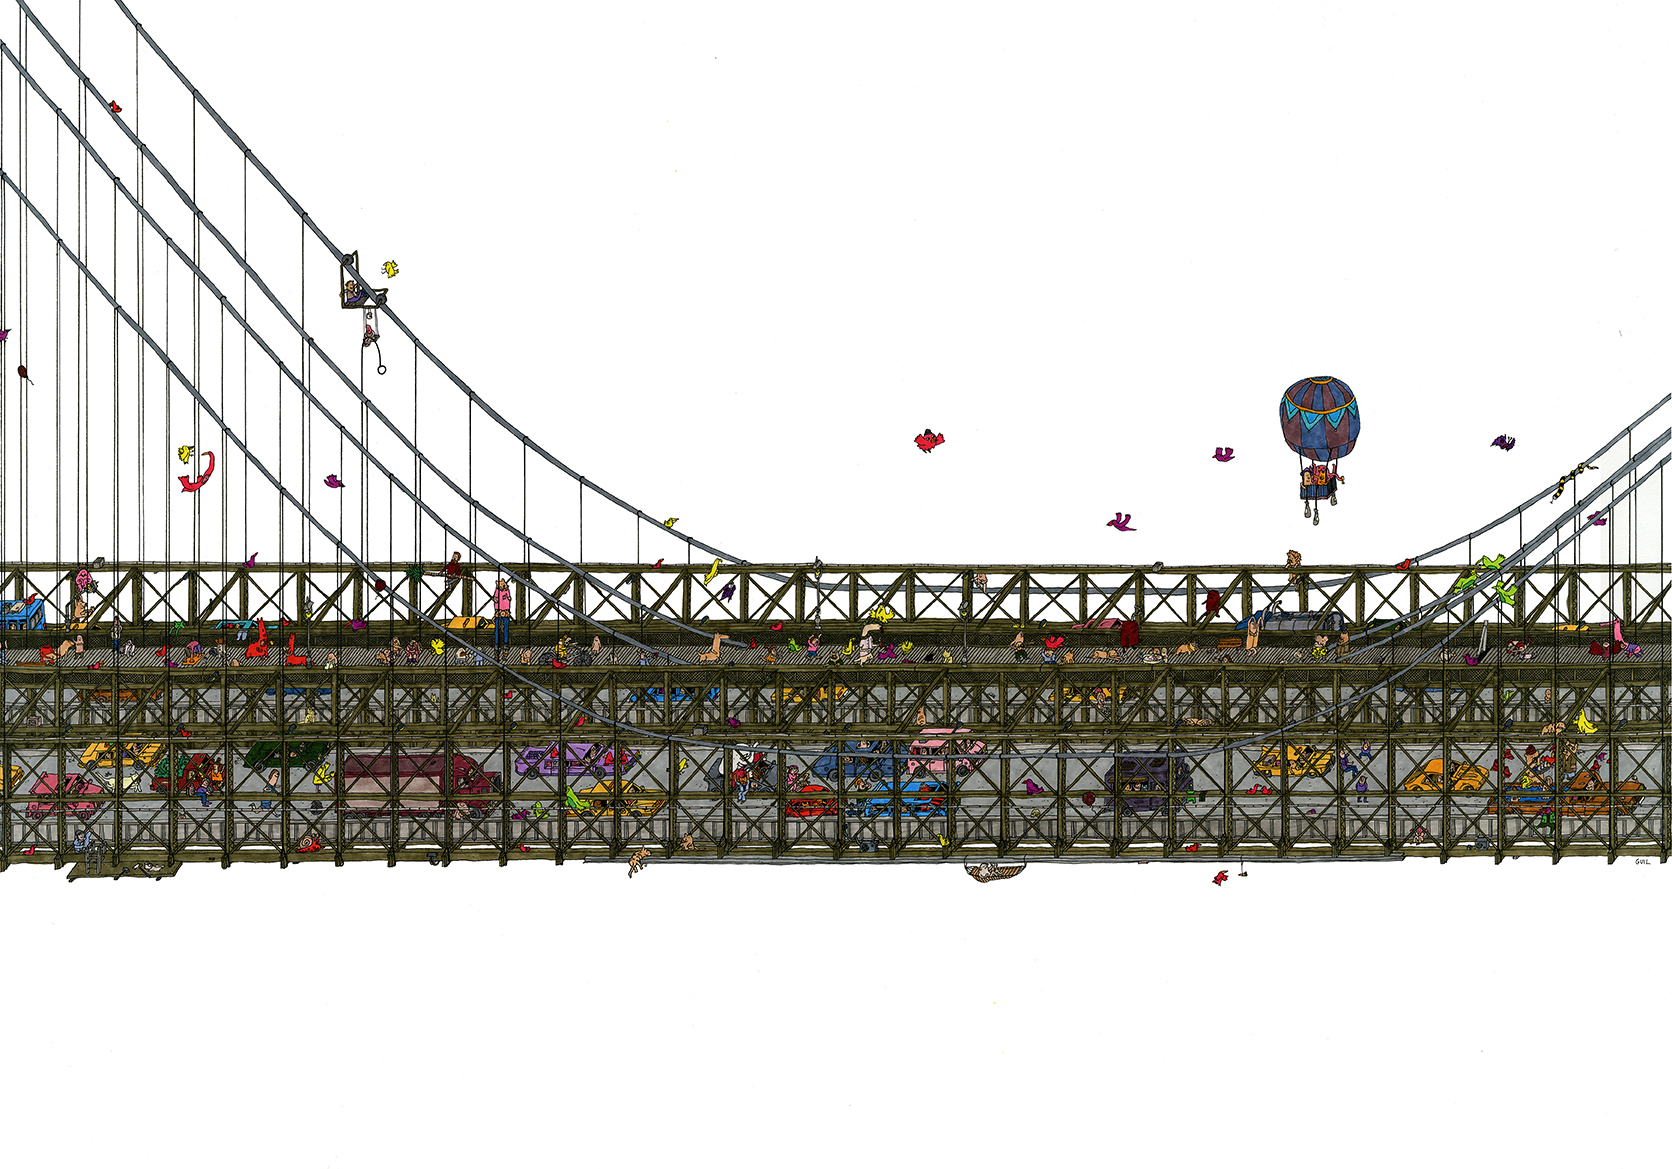 GC099_Brooklyn bridge 594 x 420mm_sm.jpg